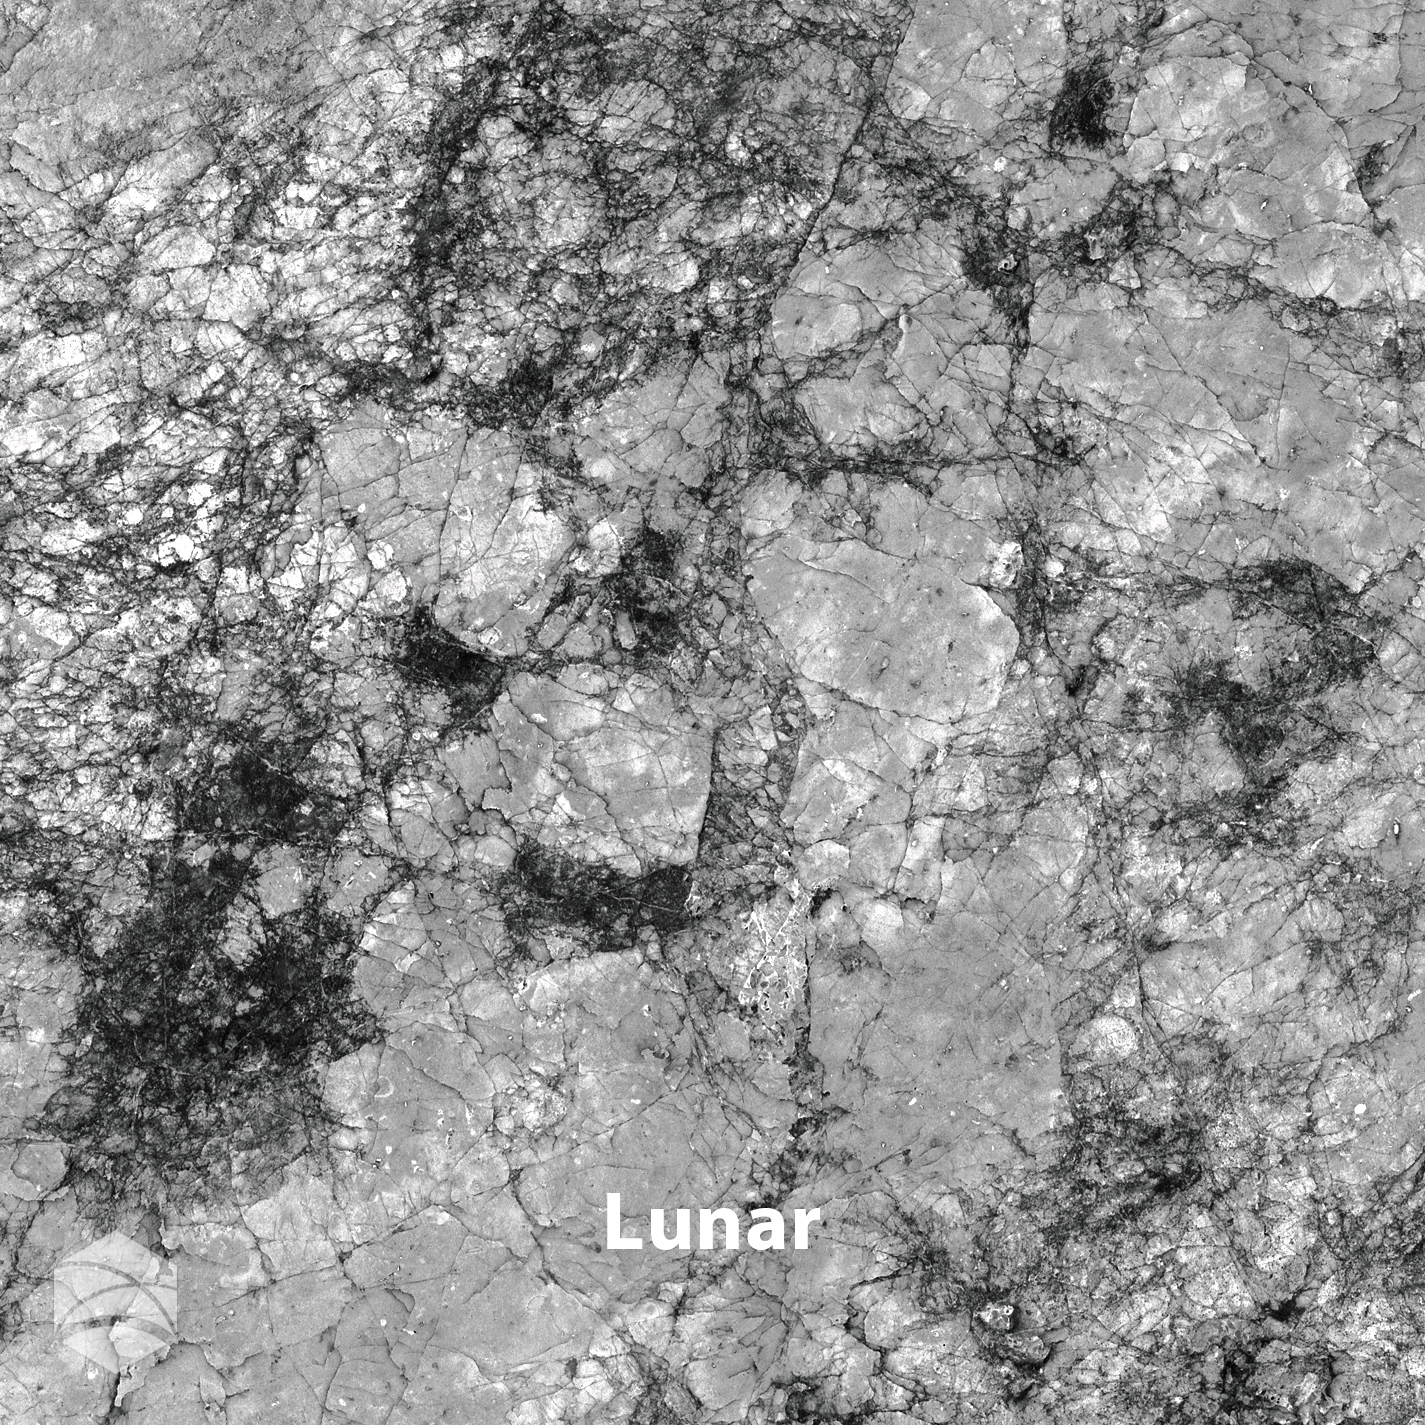 Lunar_V2_14x14.jpg